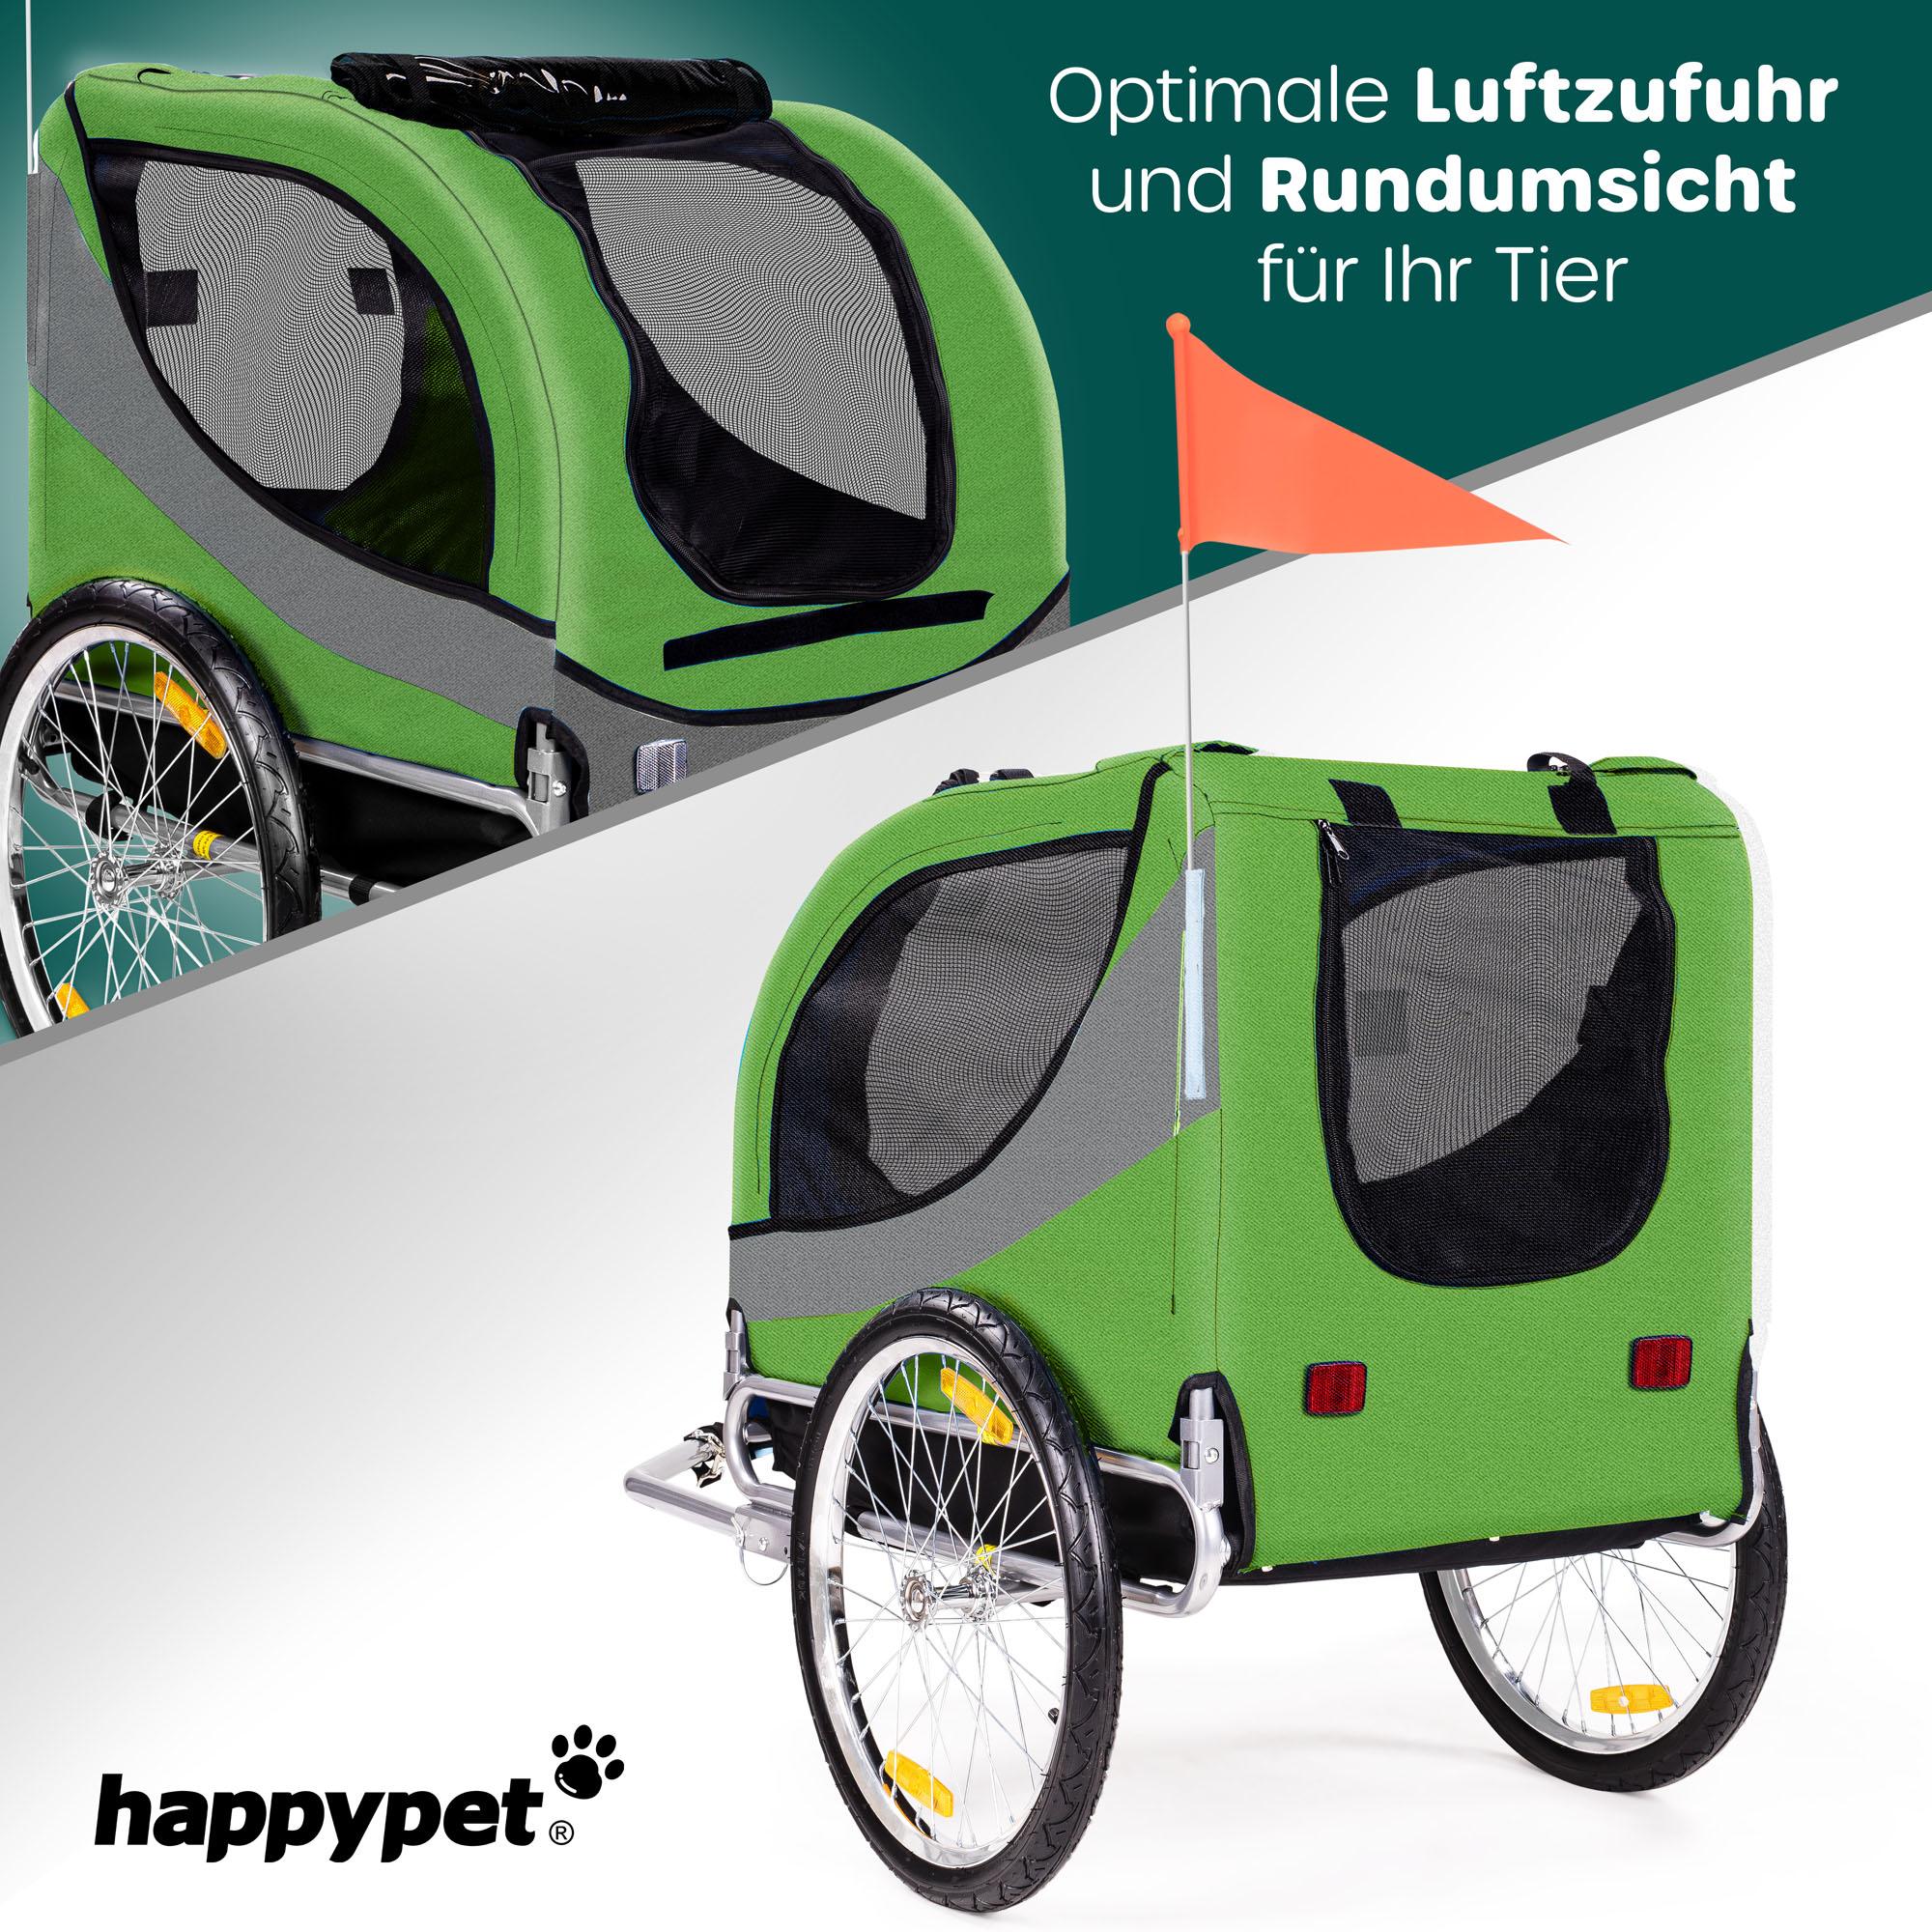 HAPPYPET® Hundeanhänger Hundetransporter Fahrradanhänger Hunde Fahrrad Anhänger